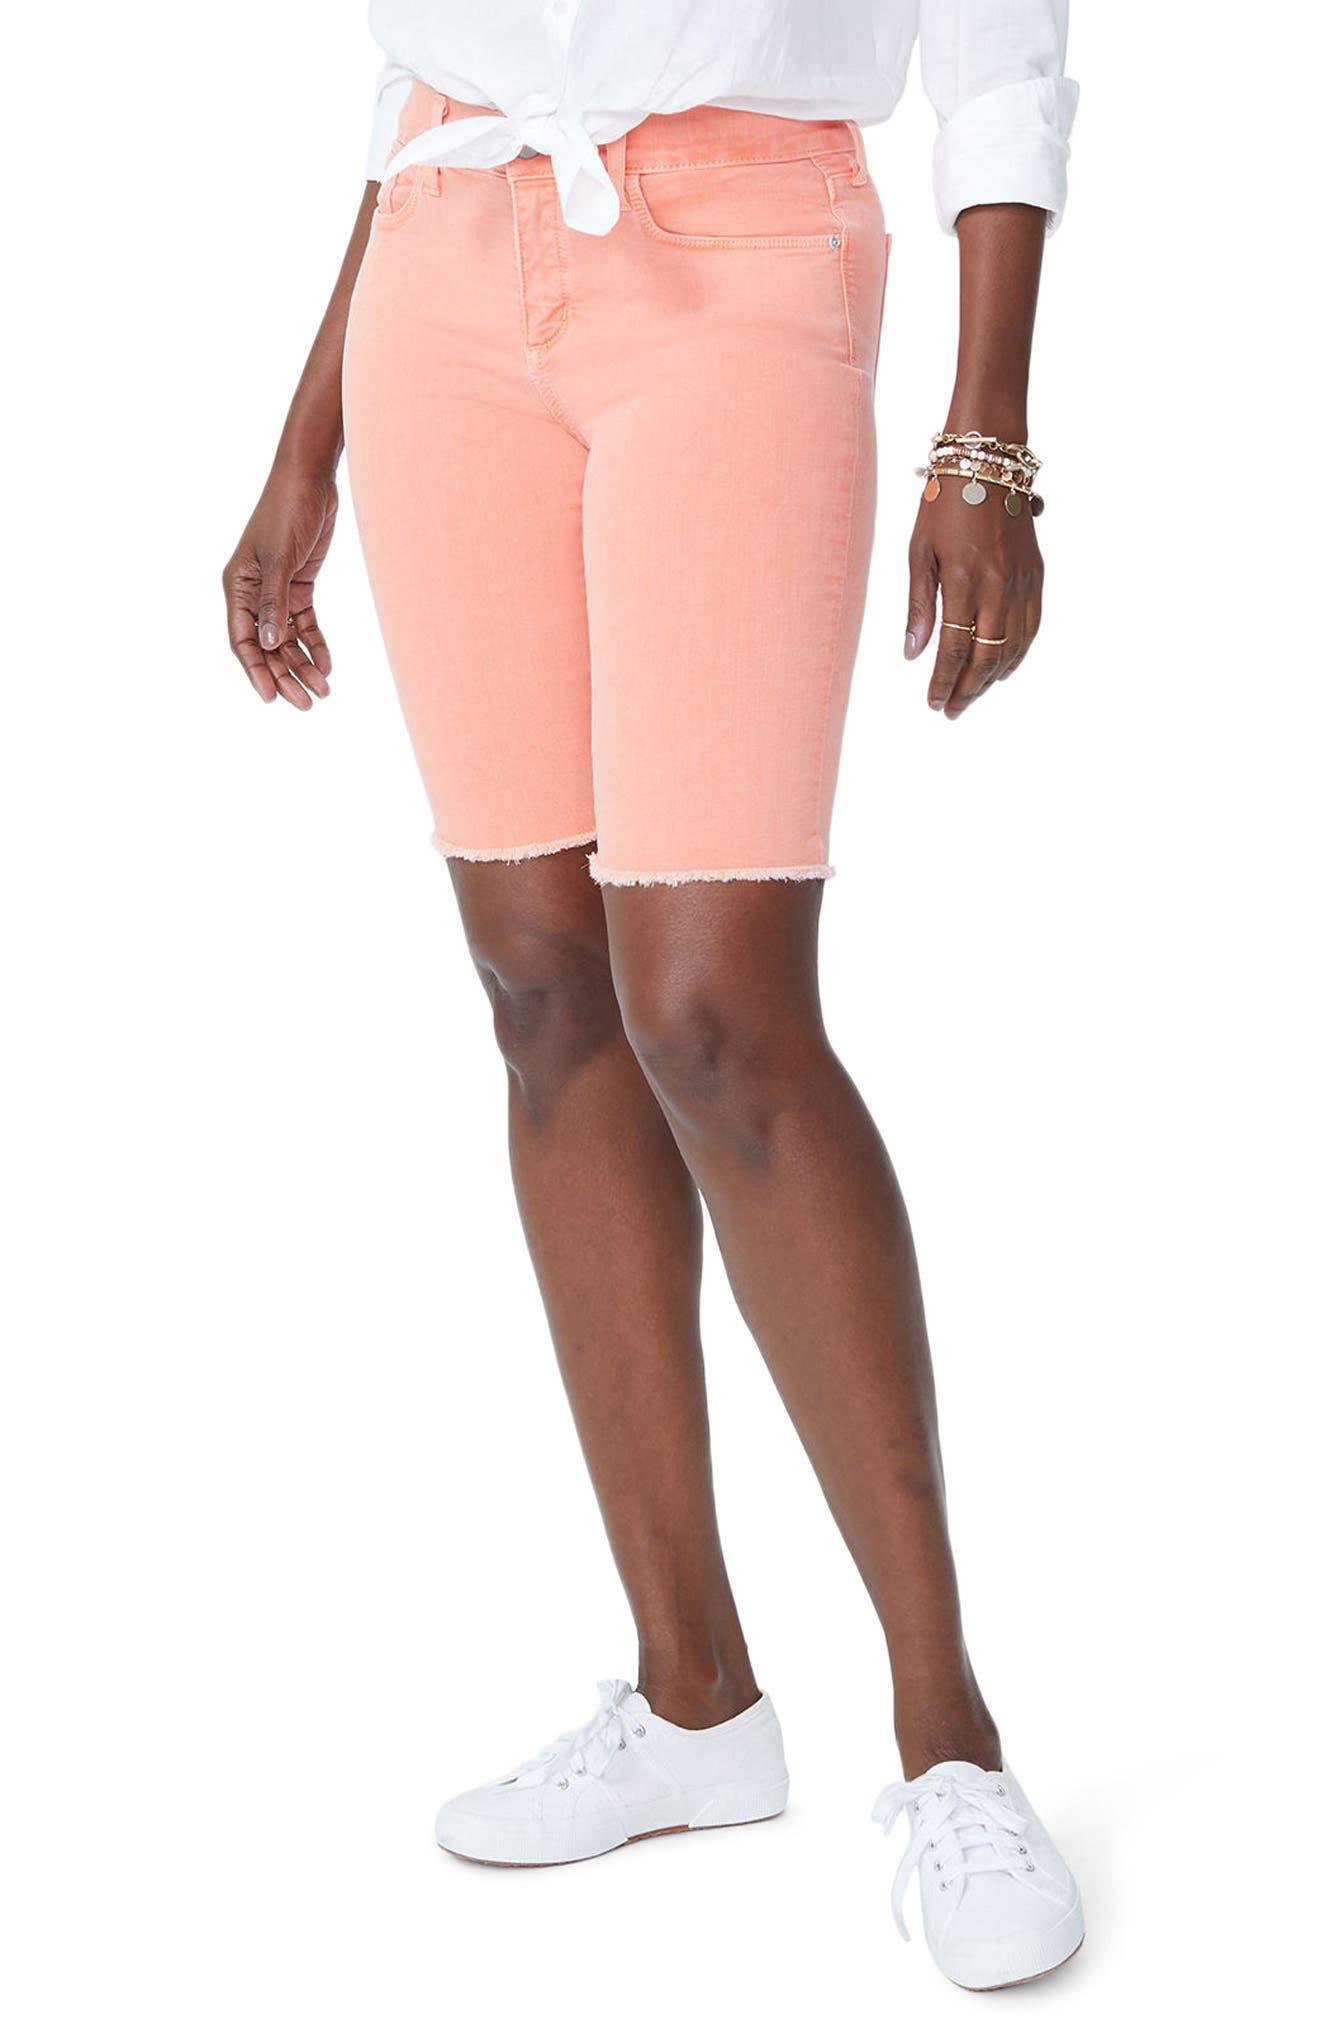 Briella Frayed Hem Bermuda Shorts,                             Main thumbnail 1, color,                             Pale Desert Flower